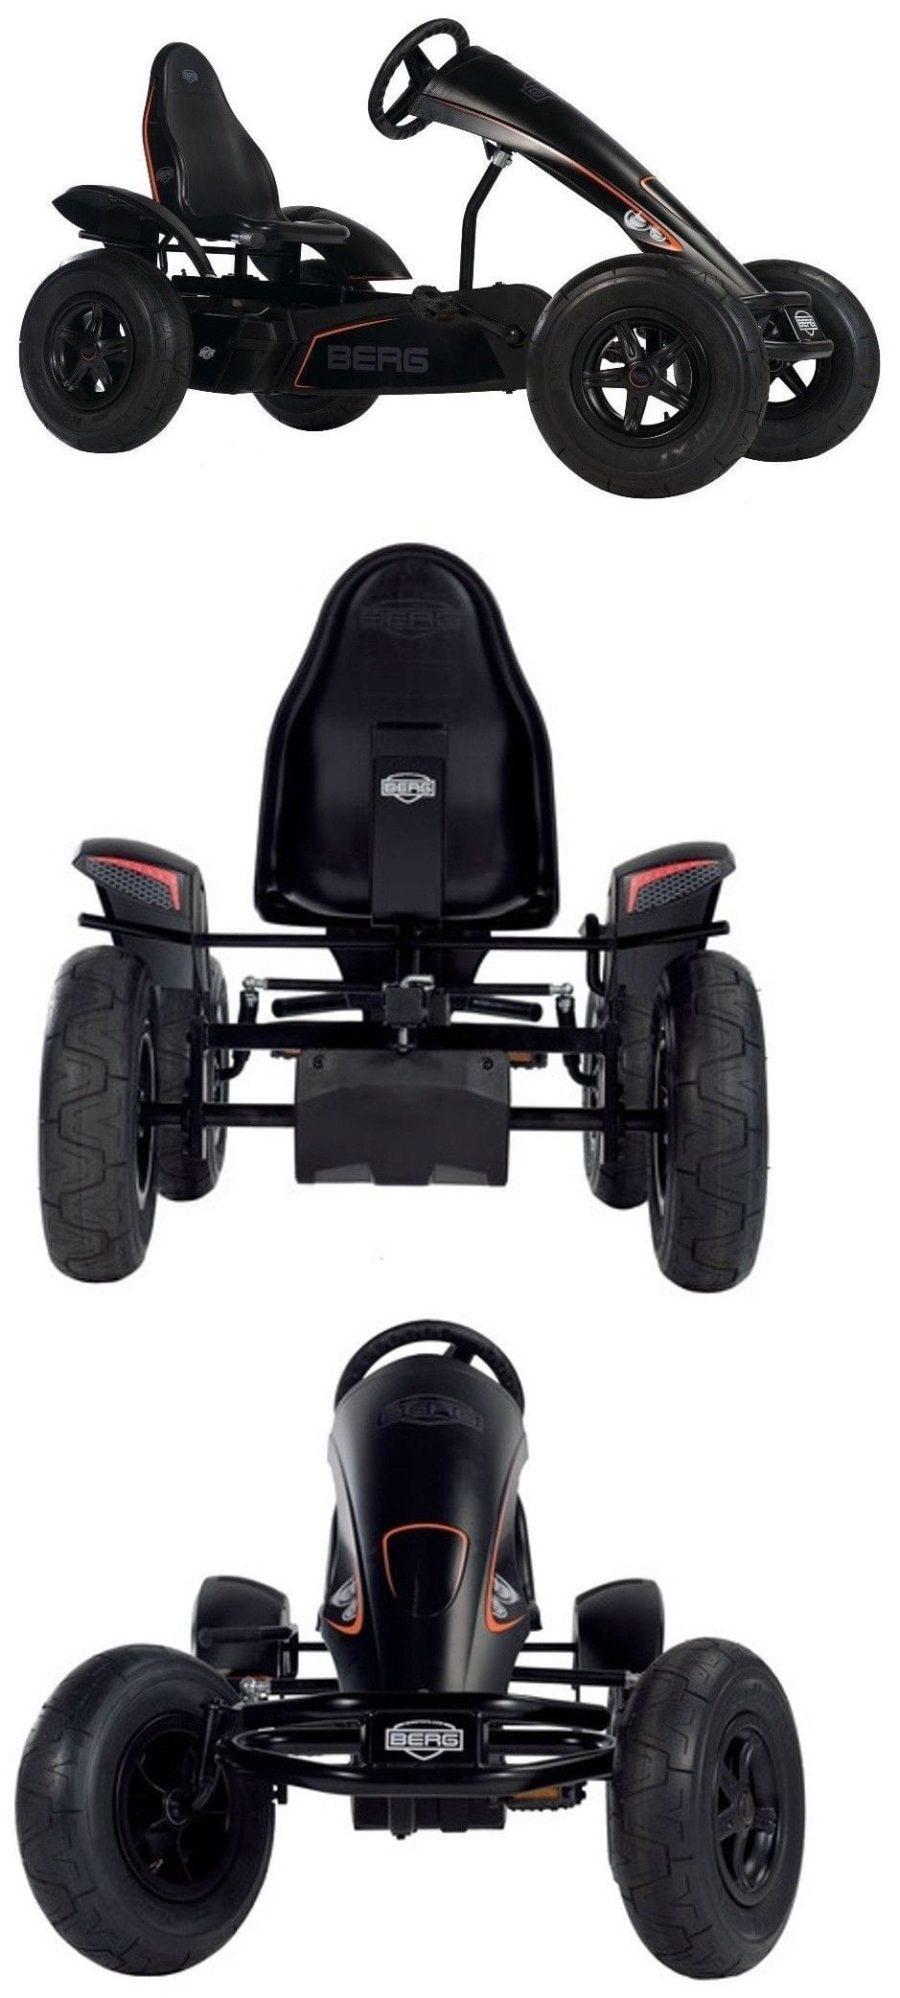 Berg Black Edition Bfr-3 Pedal Go Kart Large Go Kart